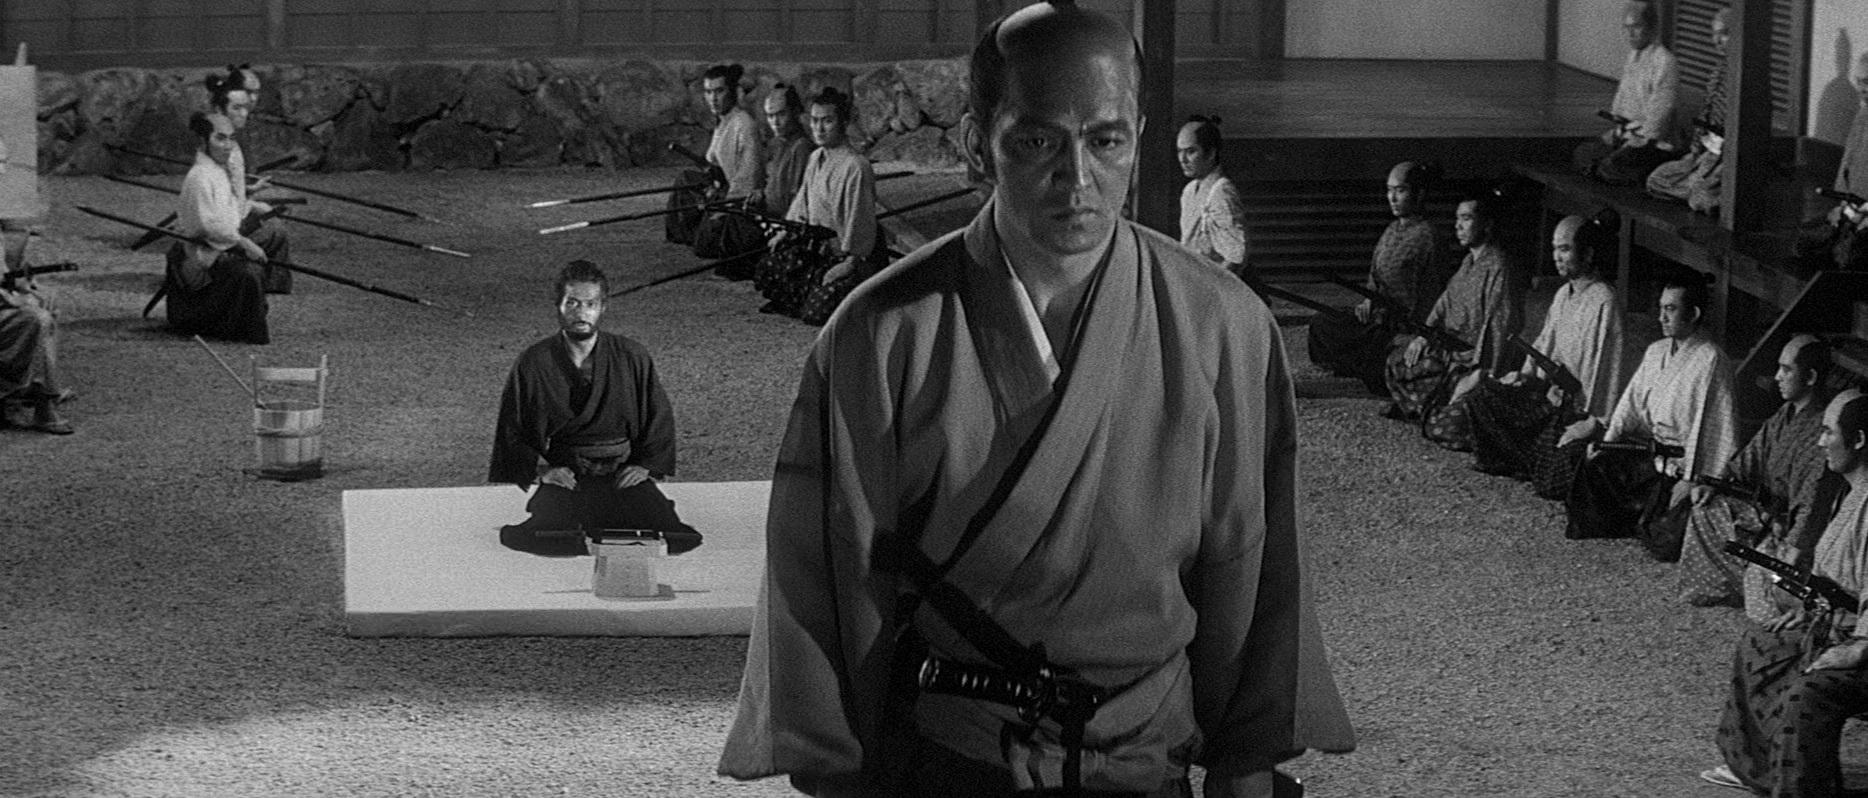 Nordling's Samurai Sunday - Nordling Commits HARAKIRI (1962)!